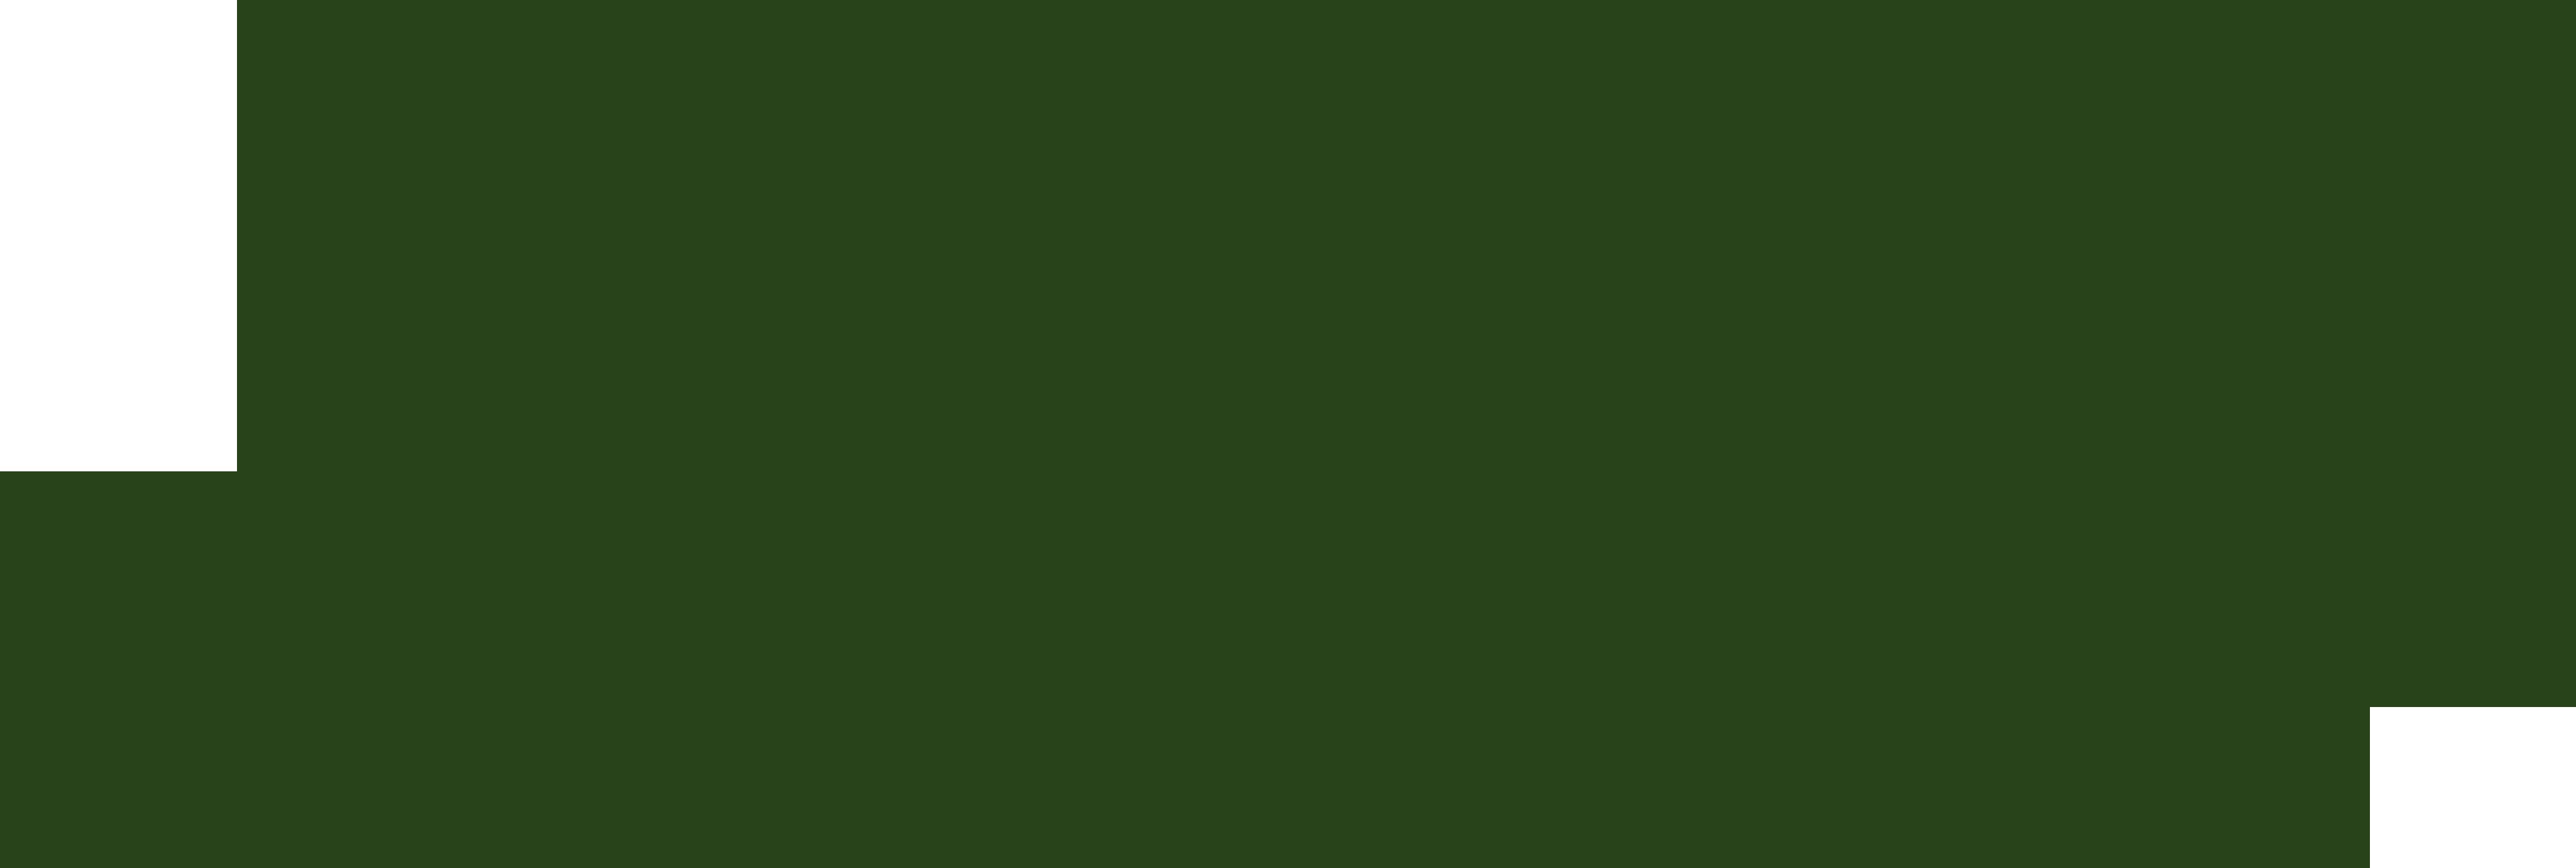 St. Hippolyt Mühlen